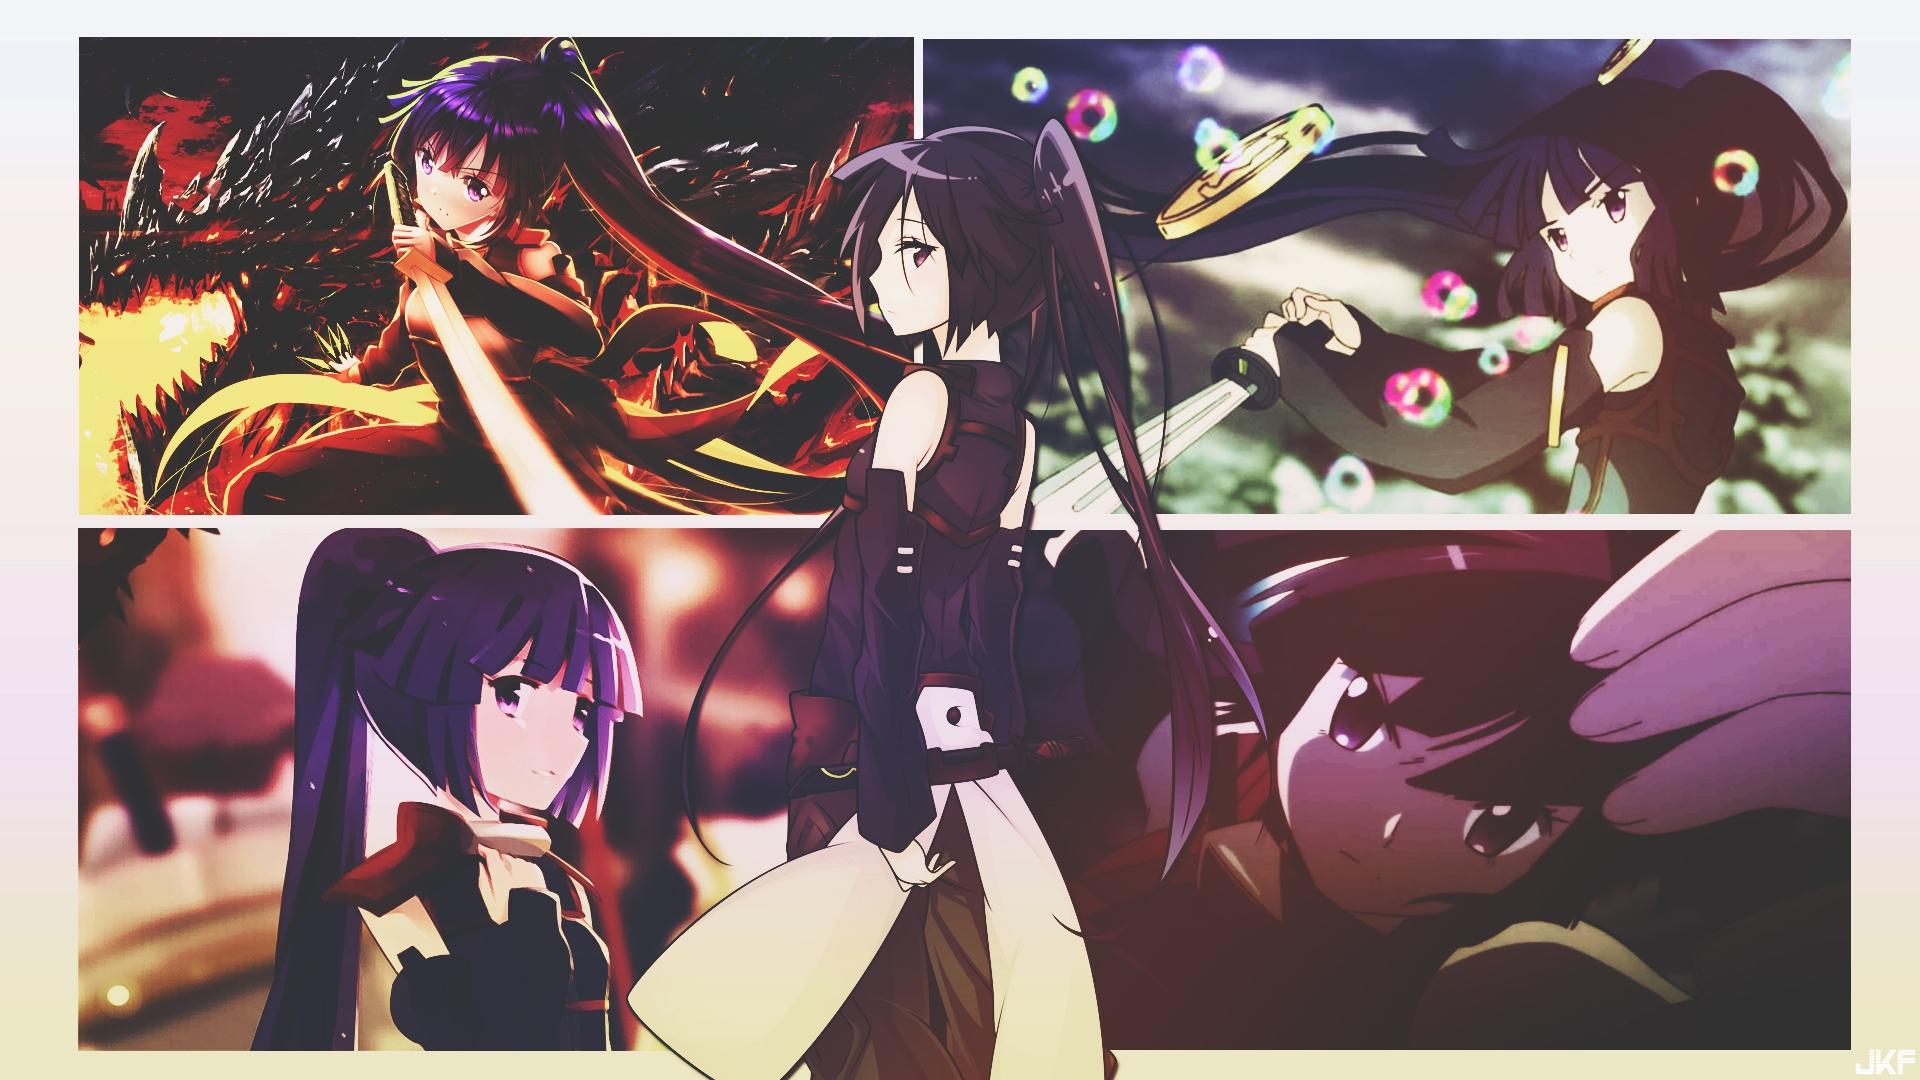 akatsuki_wallpaper_2_by_dinocojv-d95mgi4.jpg